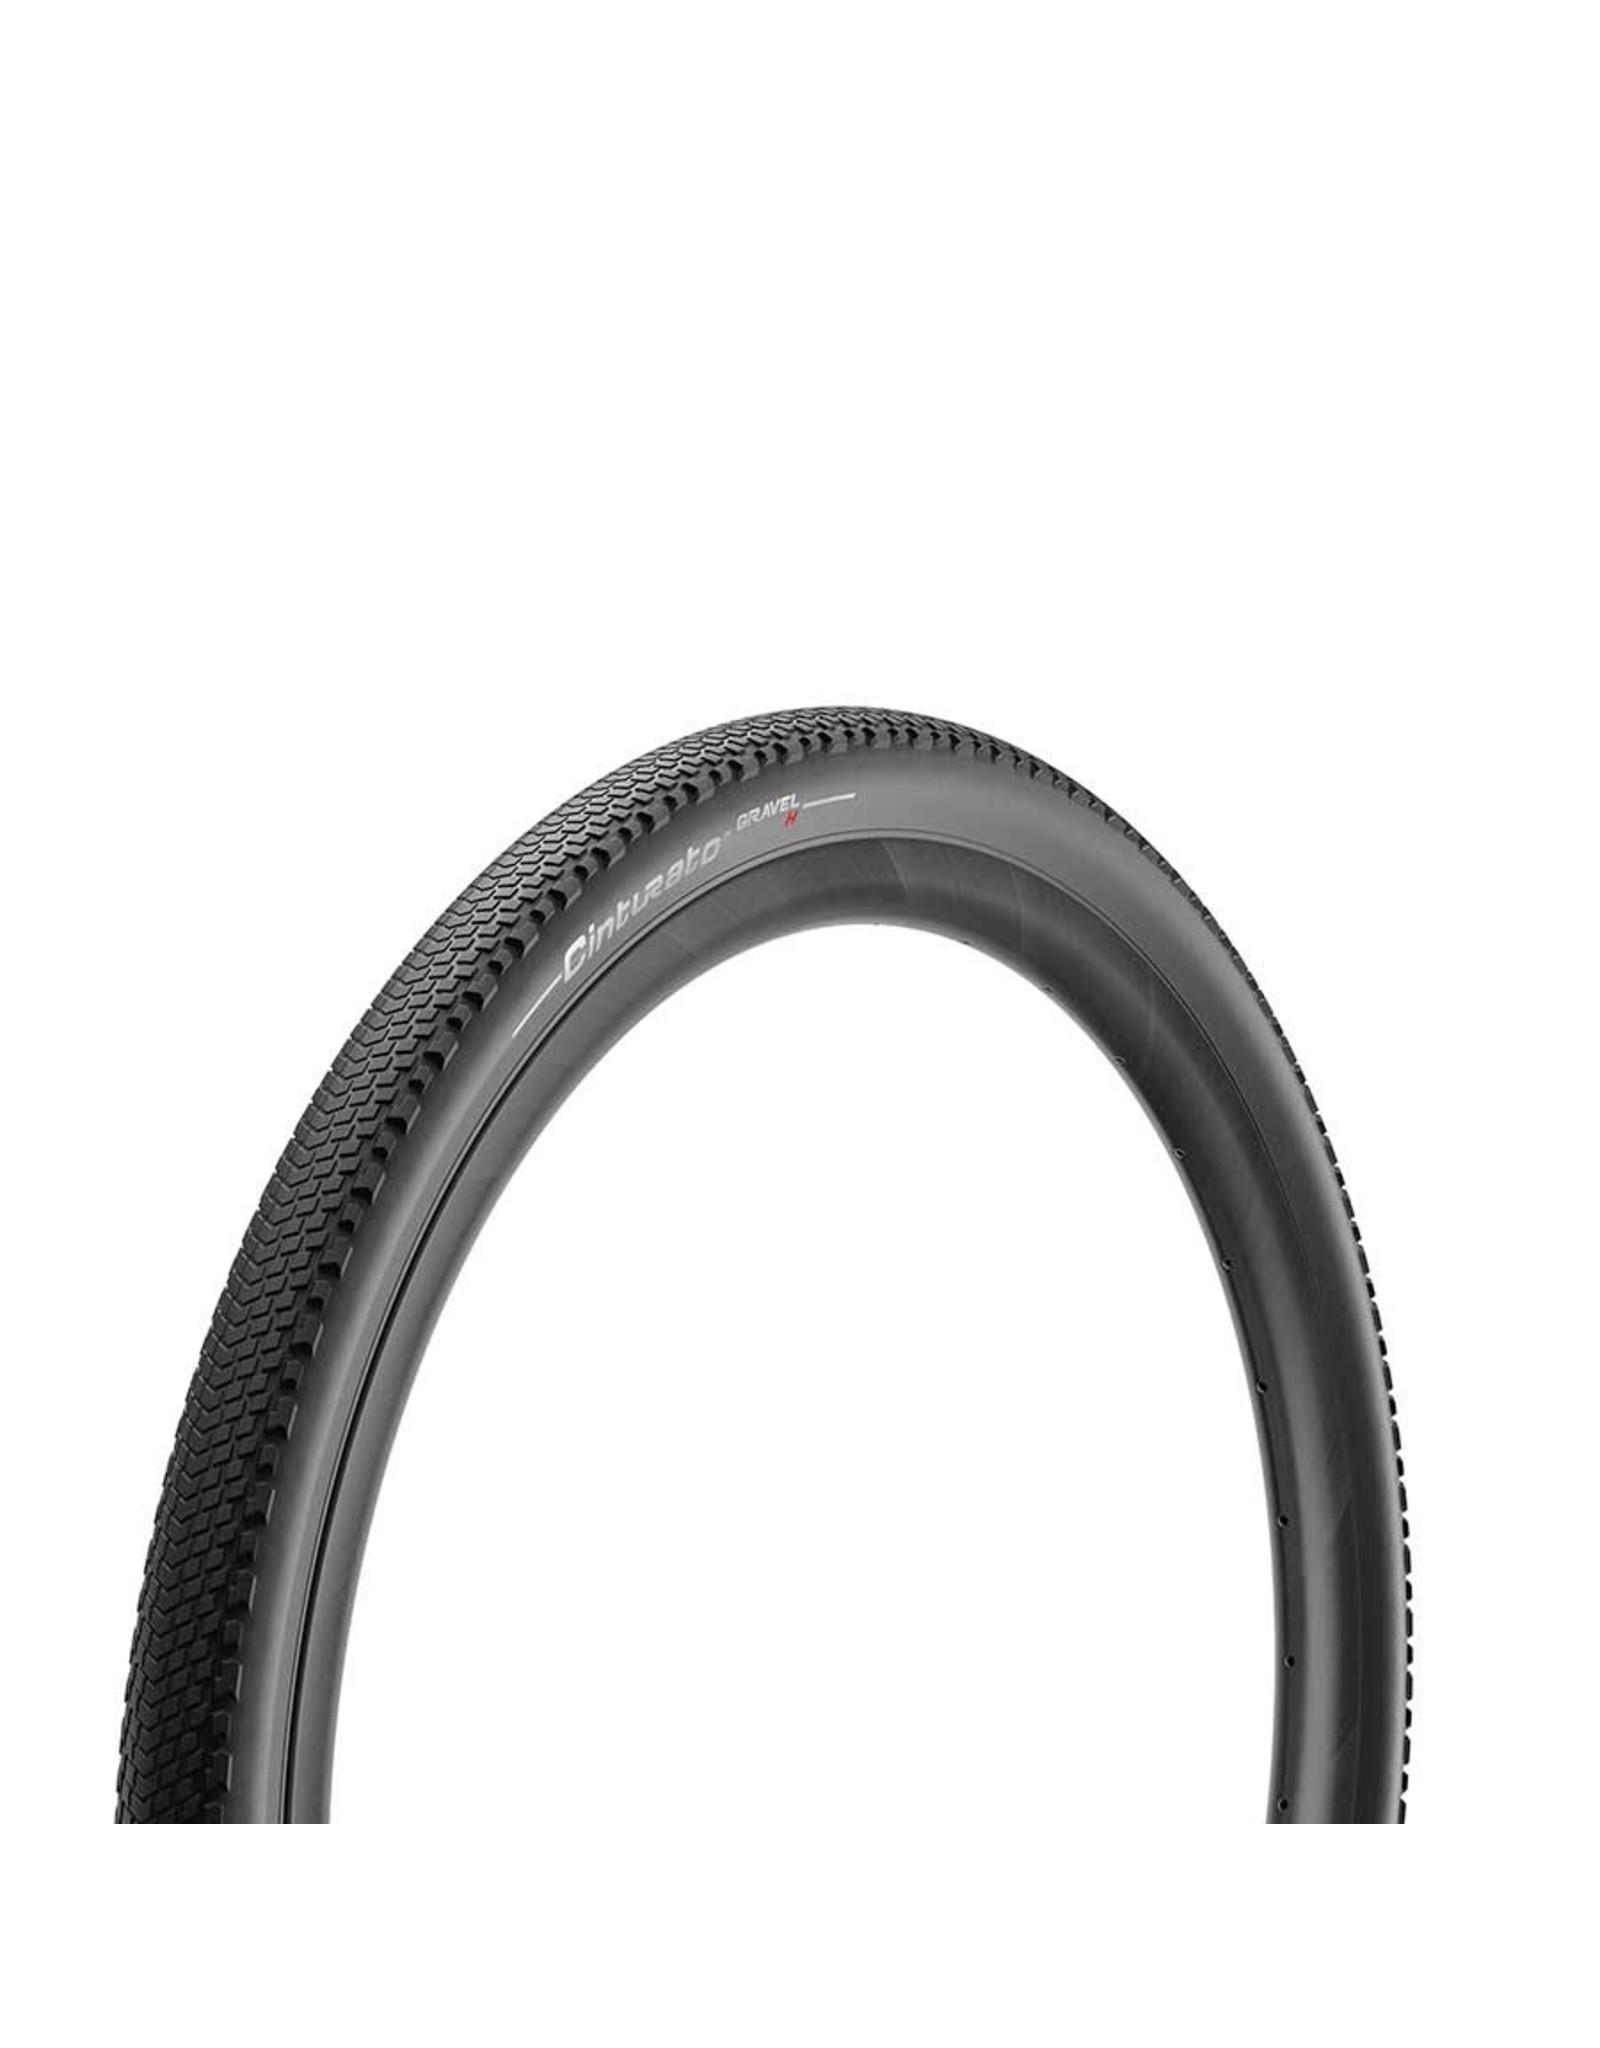 Pirelli, Cinturato Gravel H, Tire, 700x40C, Folding, Tubeless Ready, SpeedGrip, 127TPI, Black